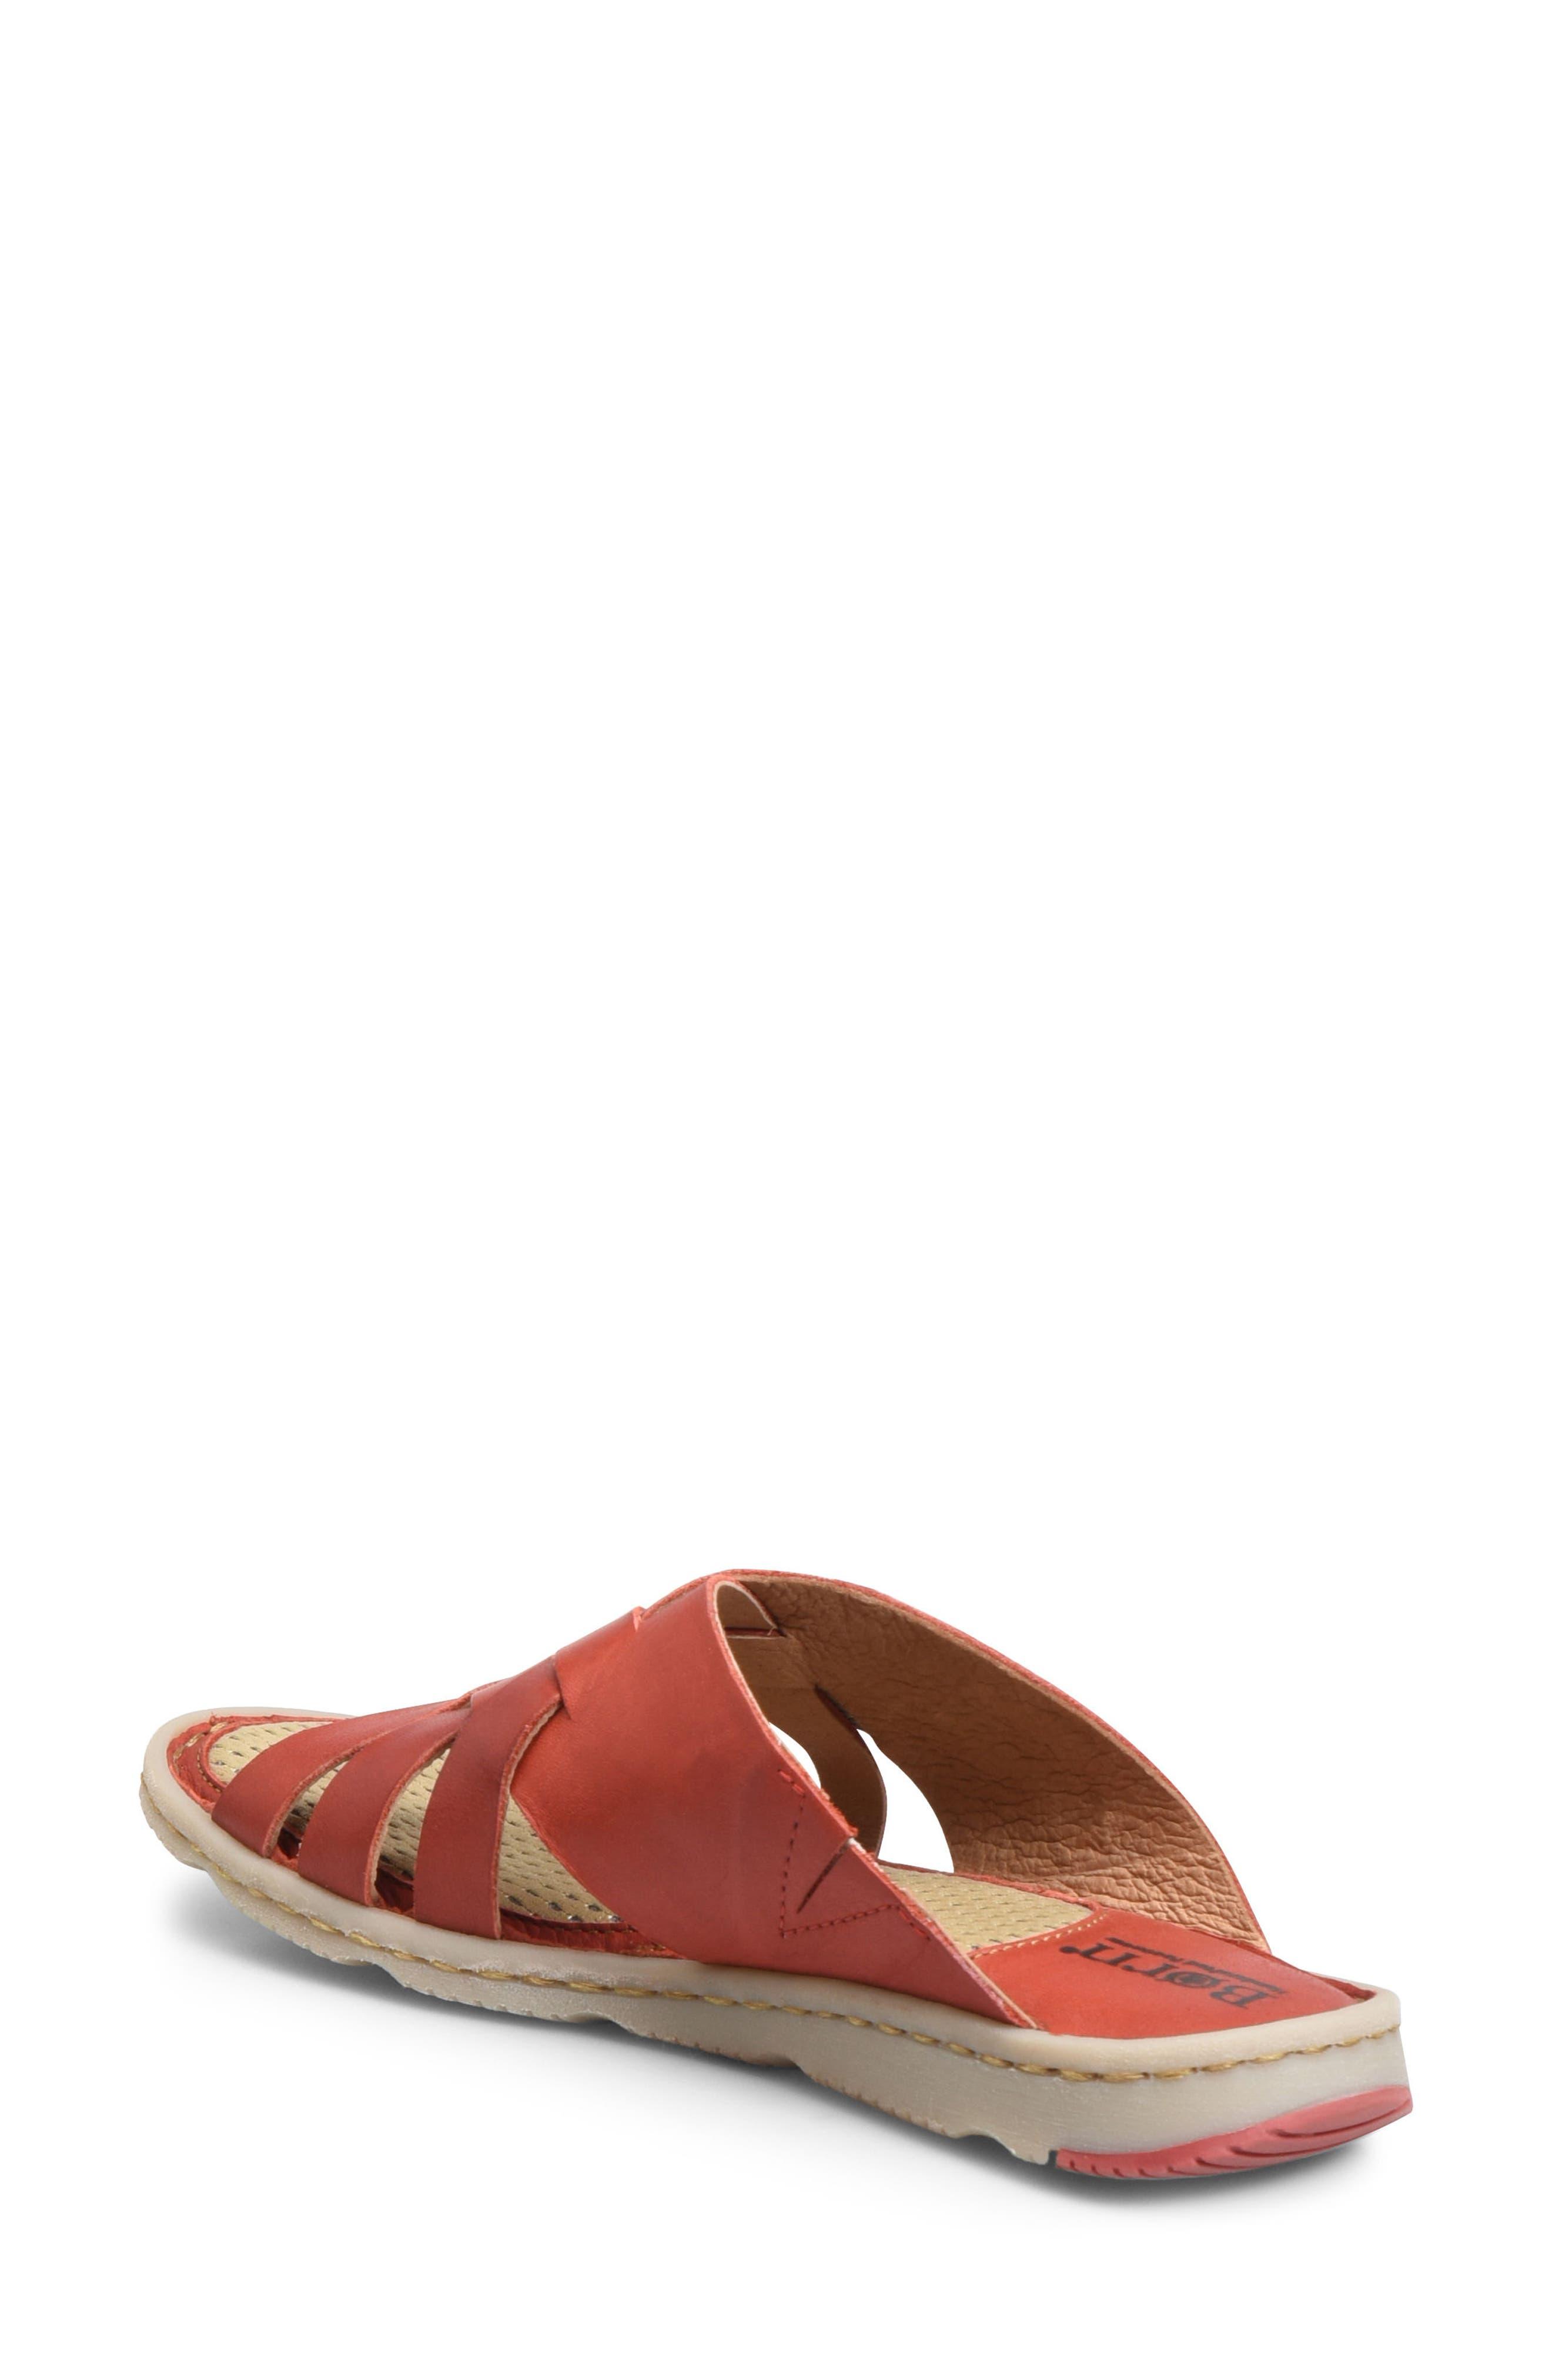 Tarpon Slide Sandal,                             Alternate thumbnail 8, color,